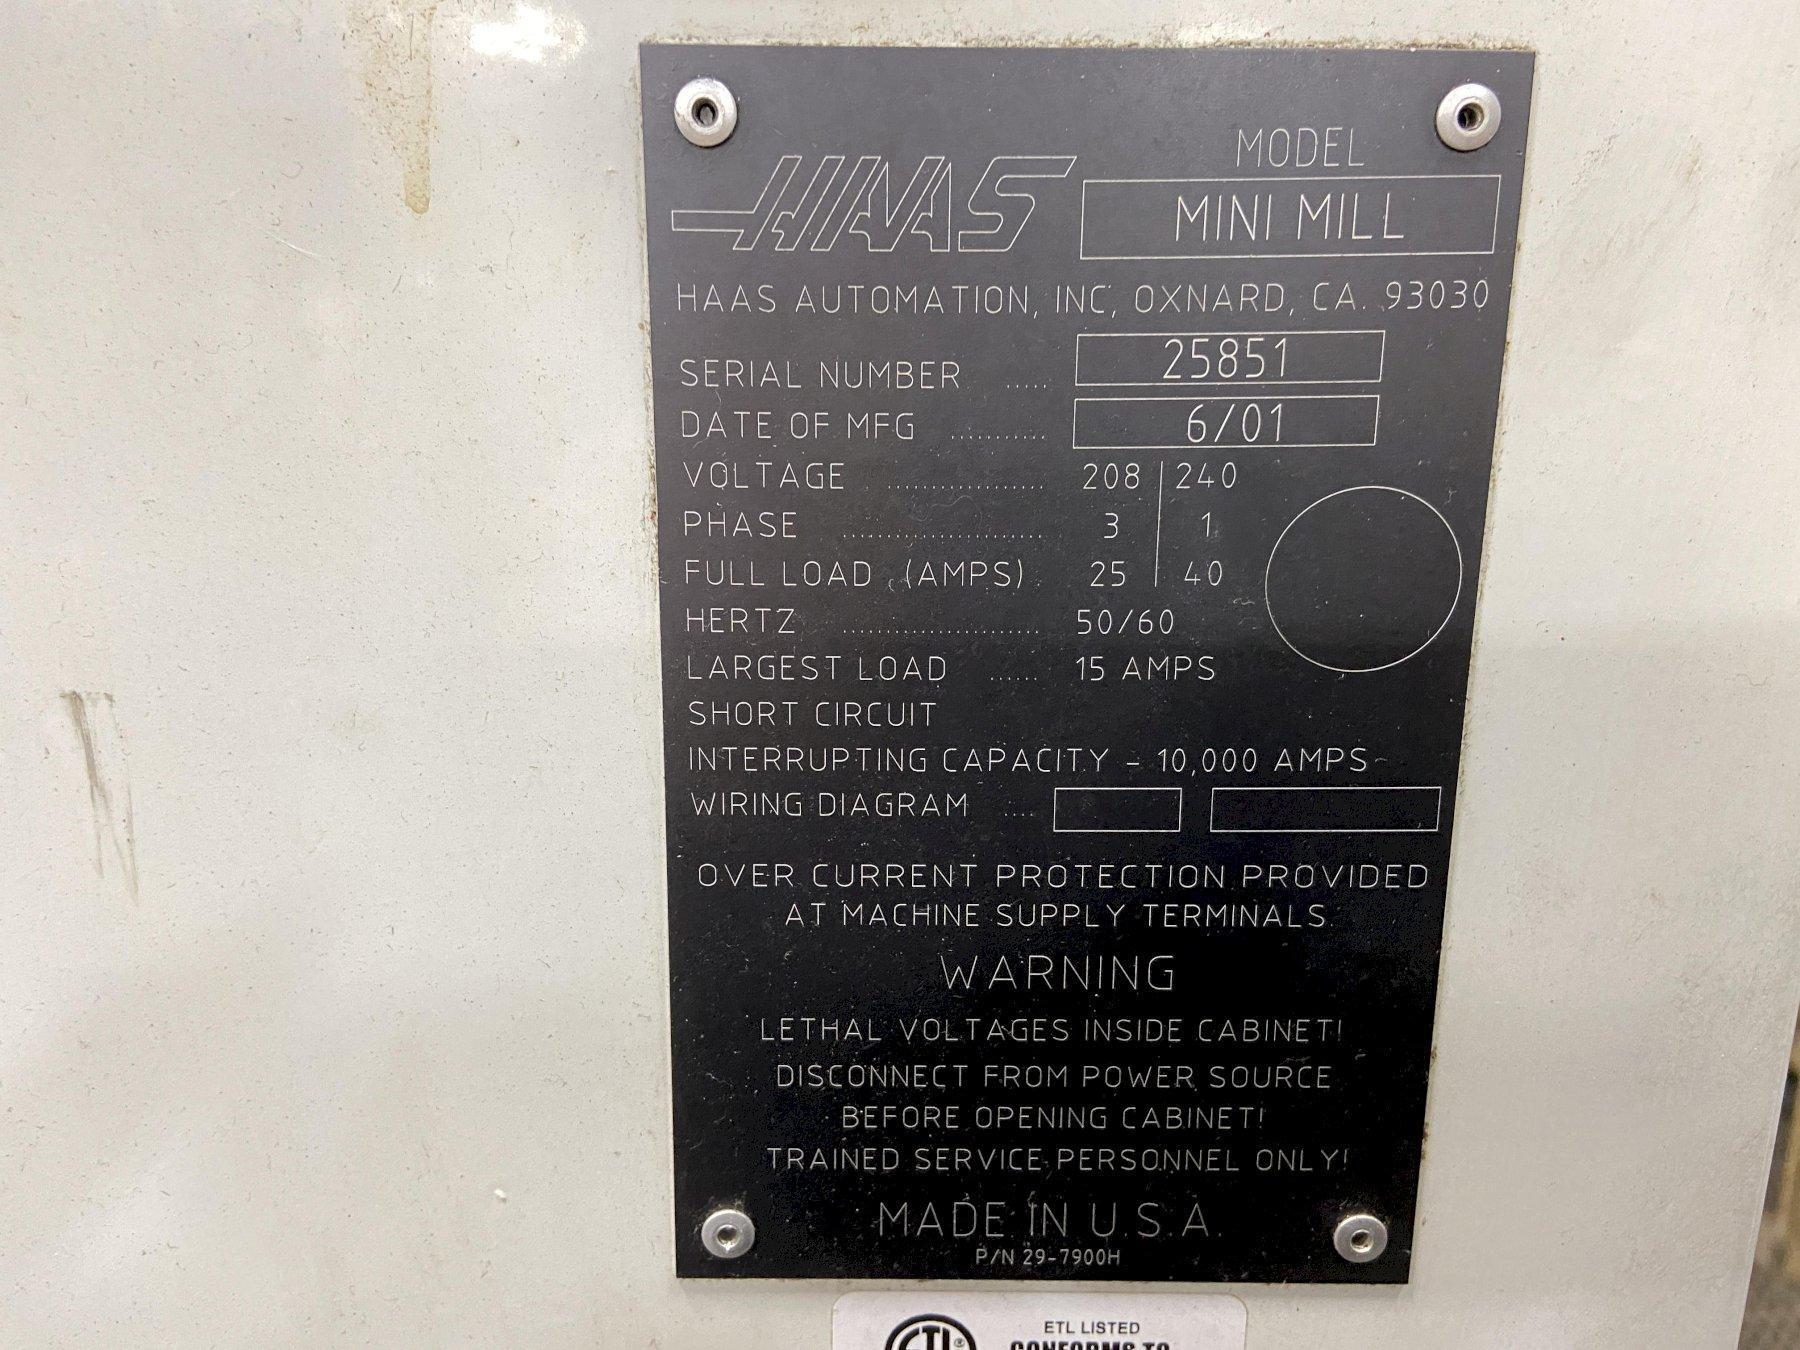 "Haas Mini Mill, 16""/12""/10"" Travels, 6K Spindle, 10 ATC, Rigid Tapping, Full Guarding, 40 Taper, 2001"